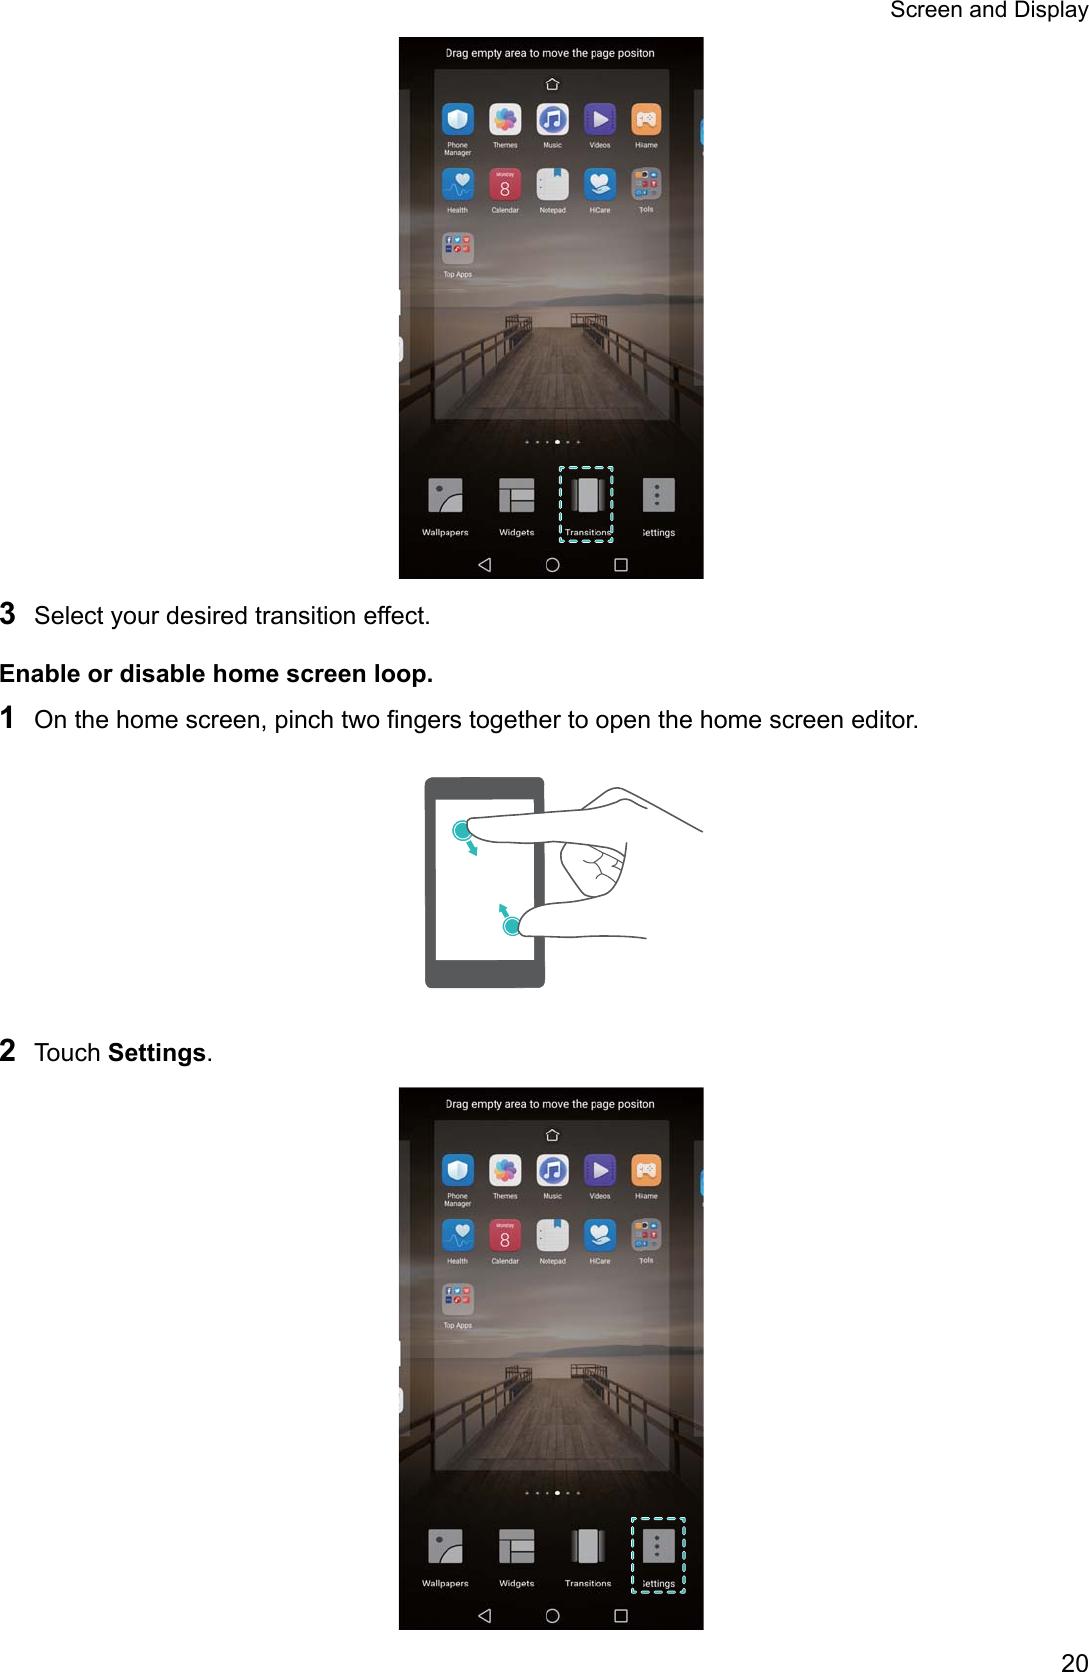 Huawei Mate 9 User Guide (MHA L29B, 01, IE)